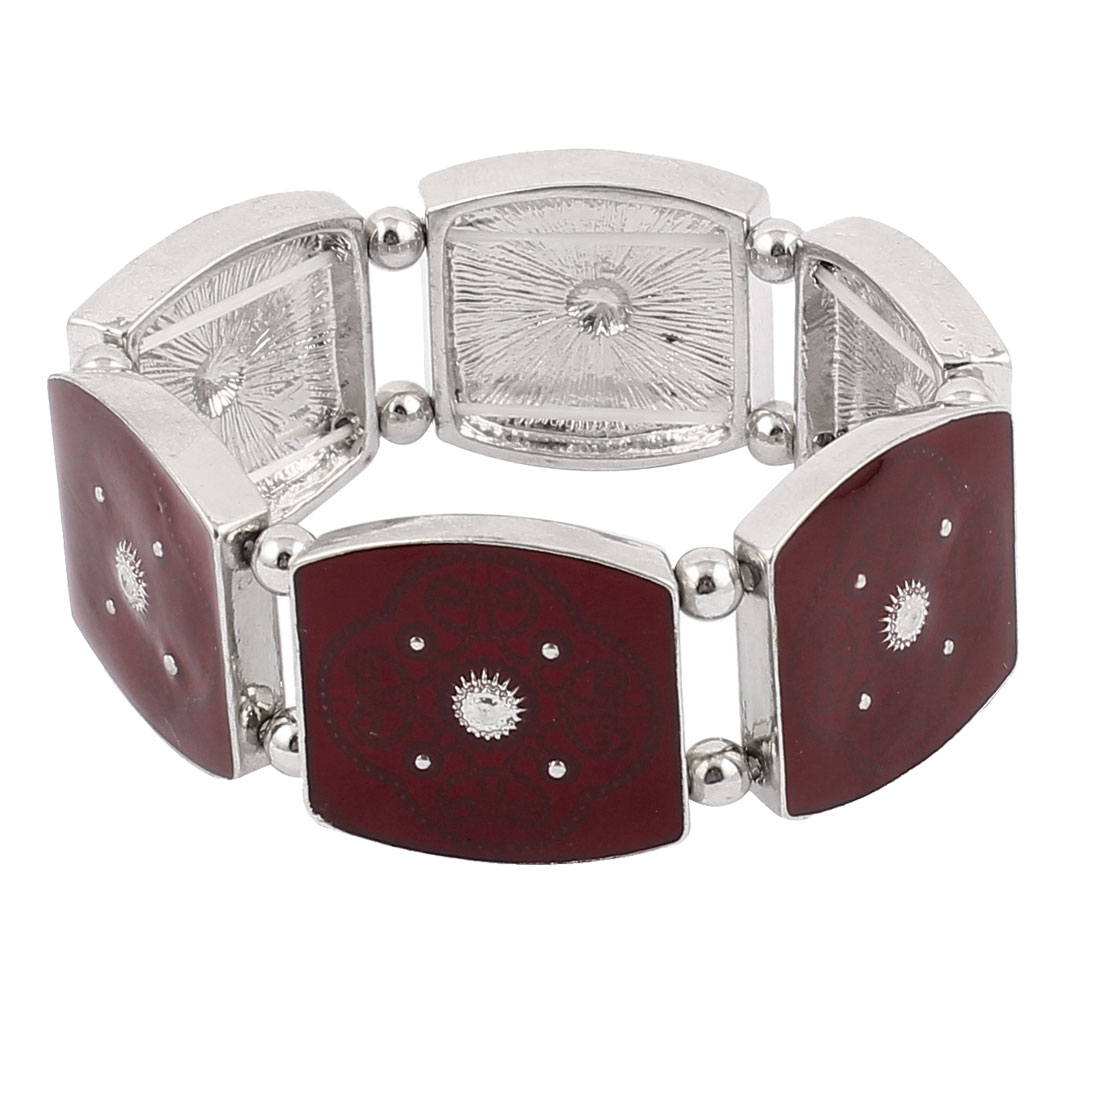 Silver Tone Carmine Metal Rhinestone Round Beads Rectangular Bracelet Bangle for Lady Women Men